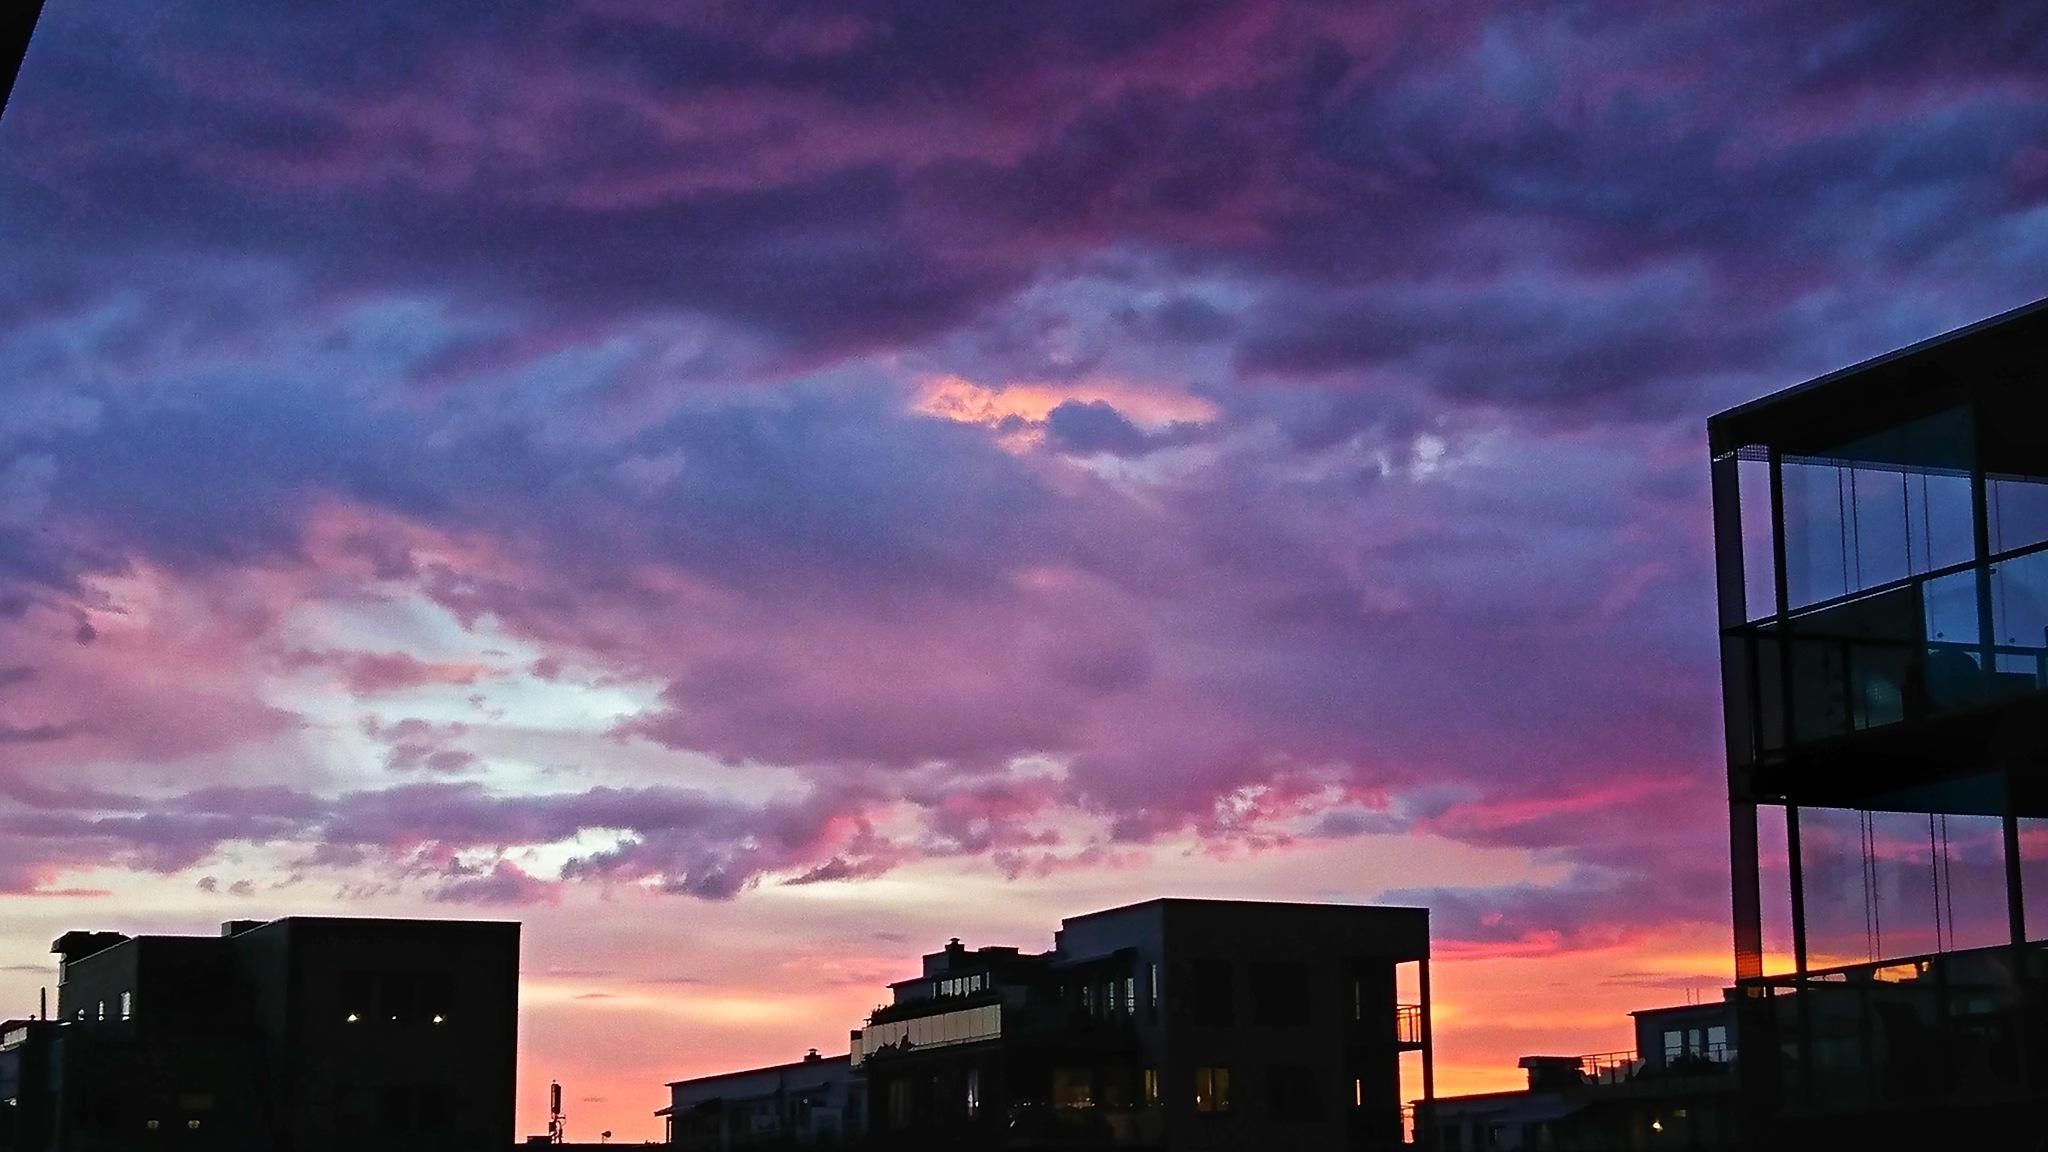 Last nights sunset by Krister Honkonen